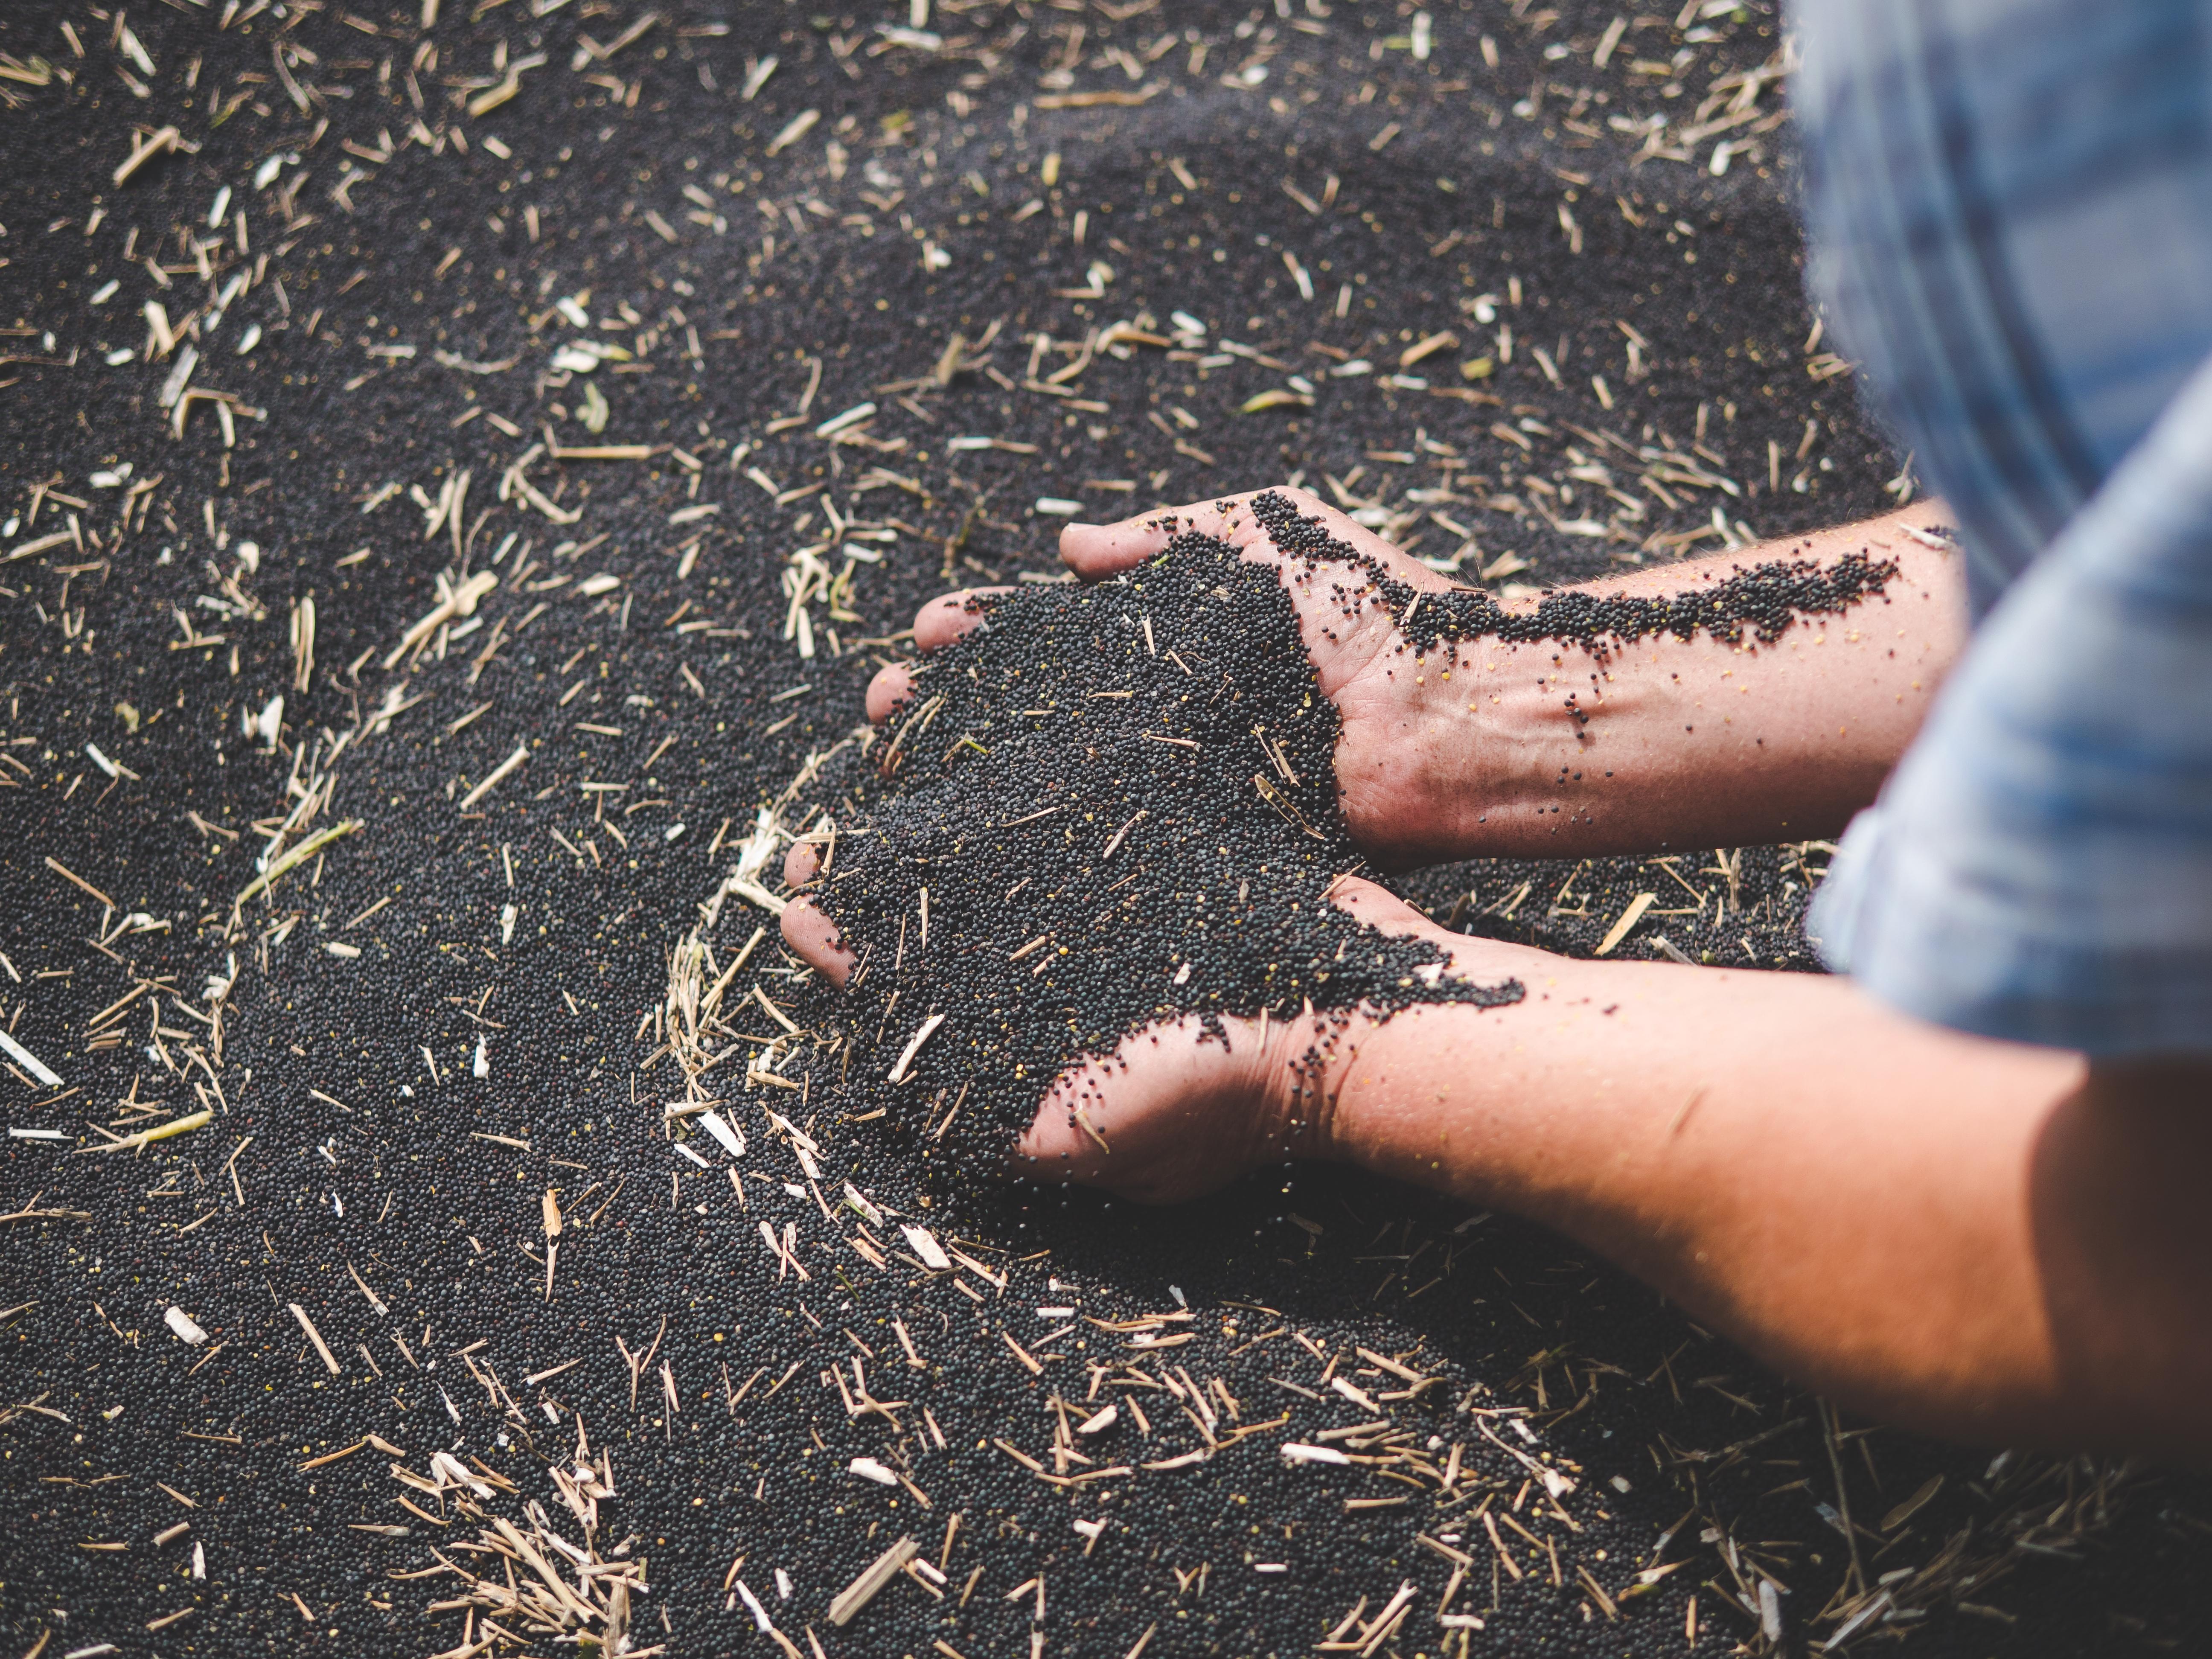 Oilseed rape_Romania_2020 image